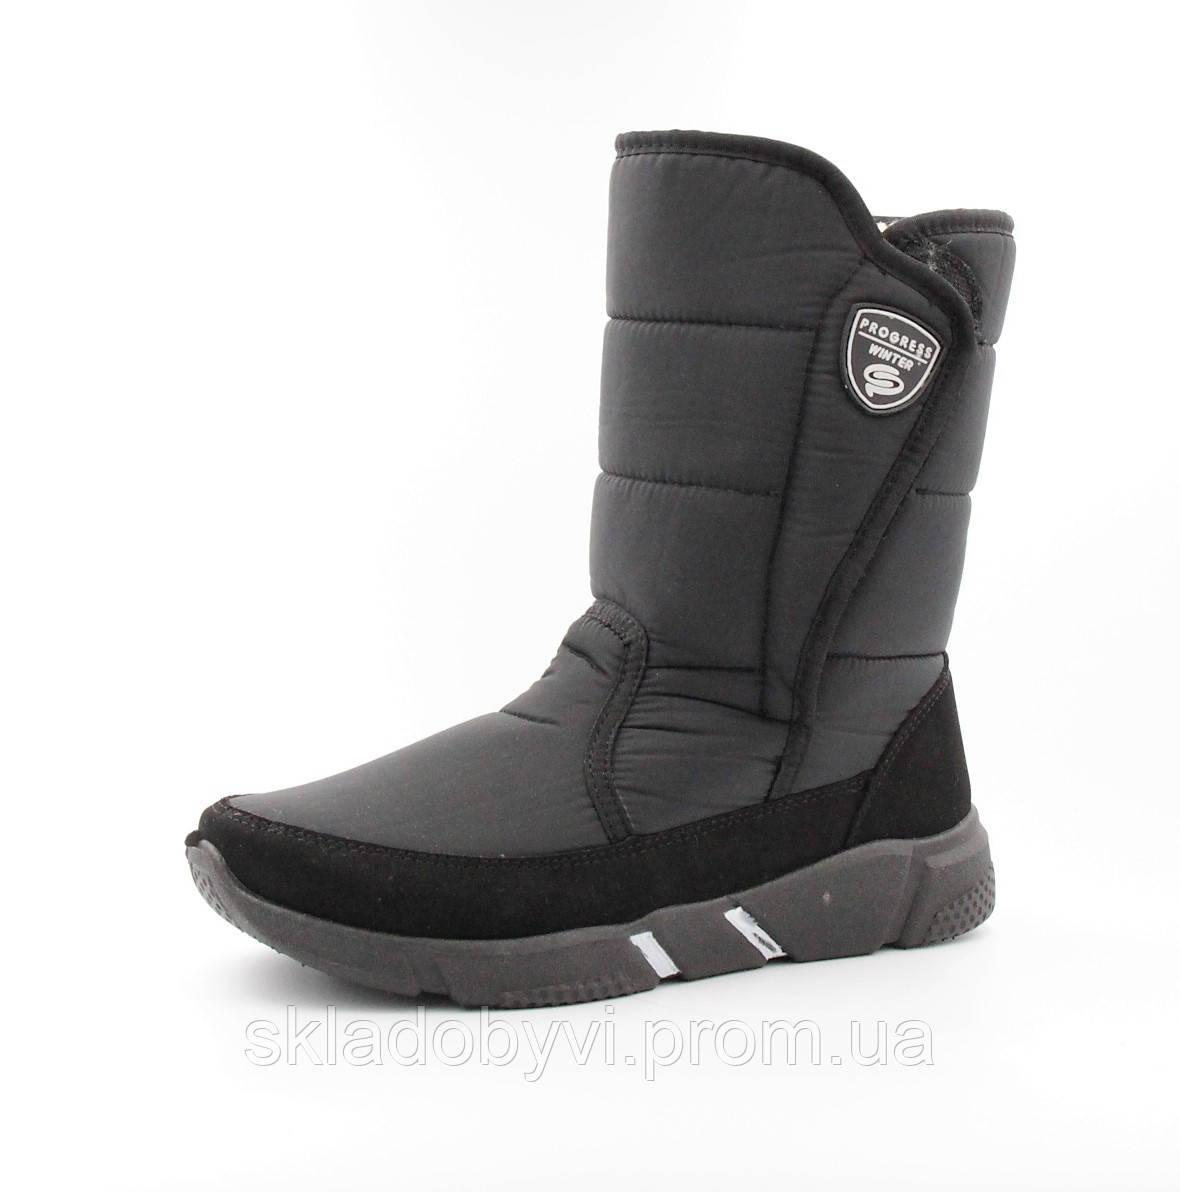 Мужские ботинки 3634